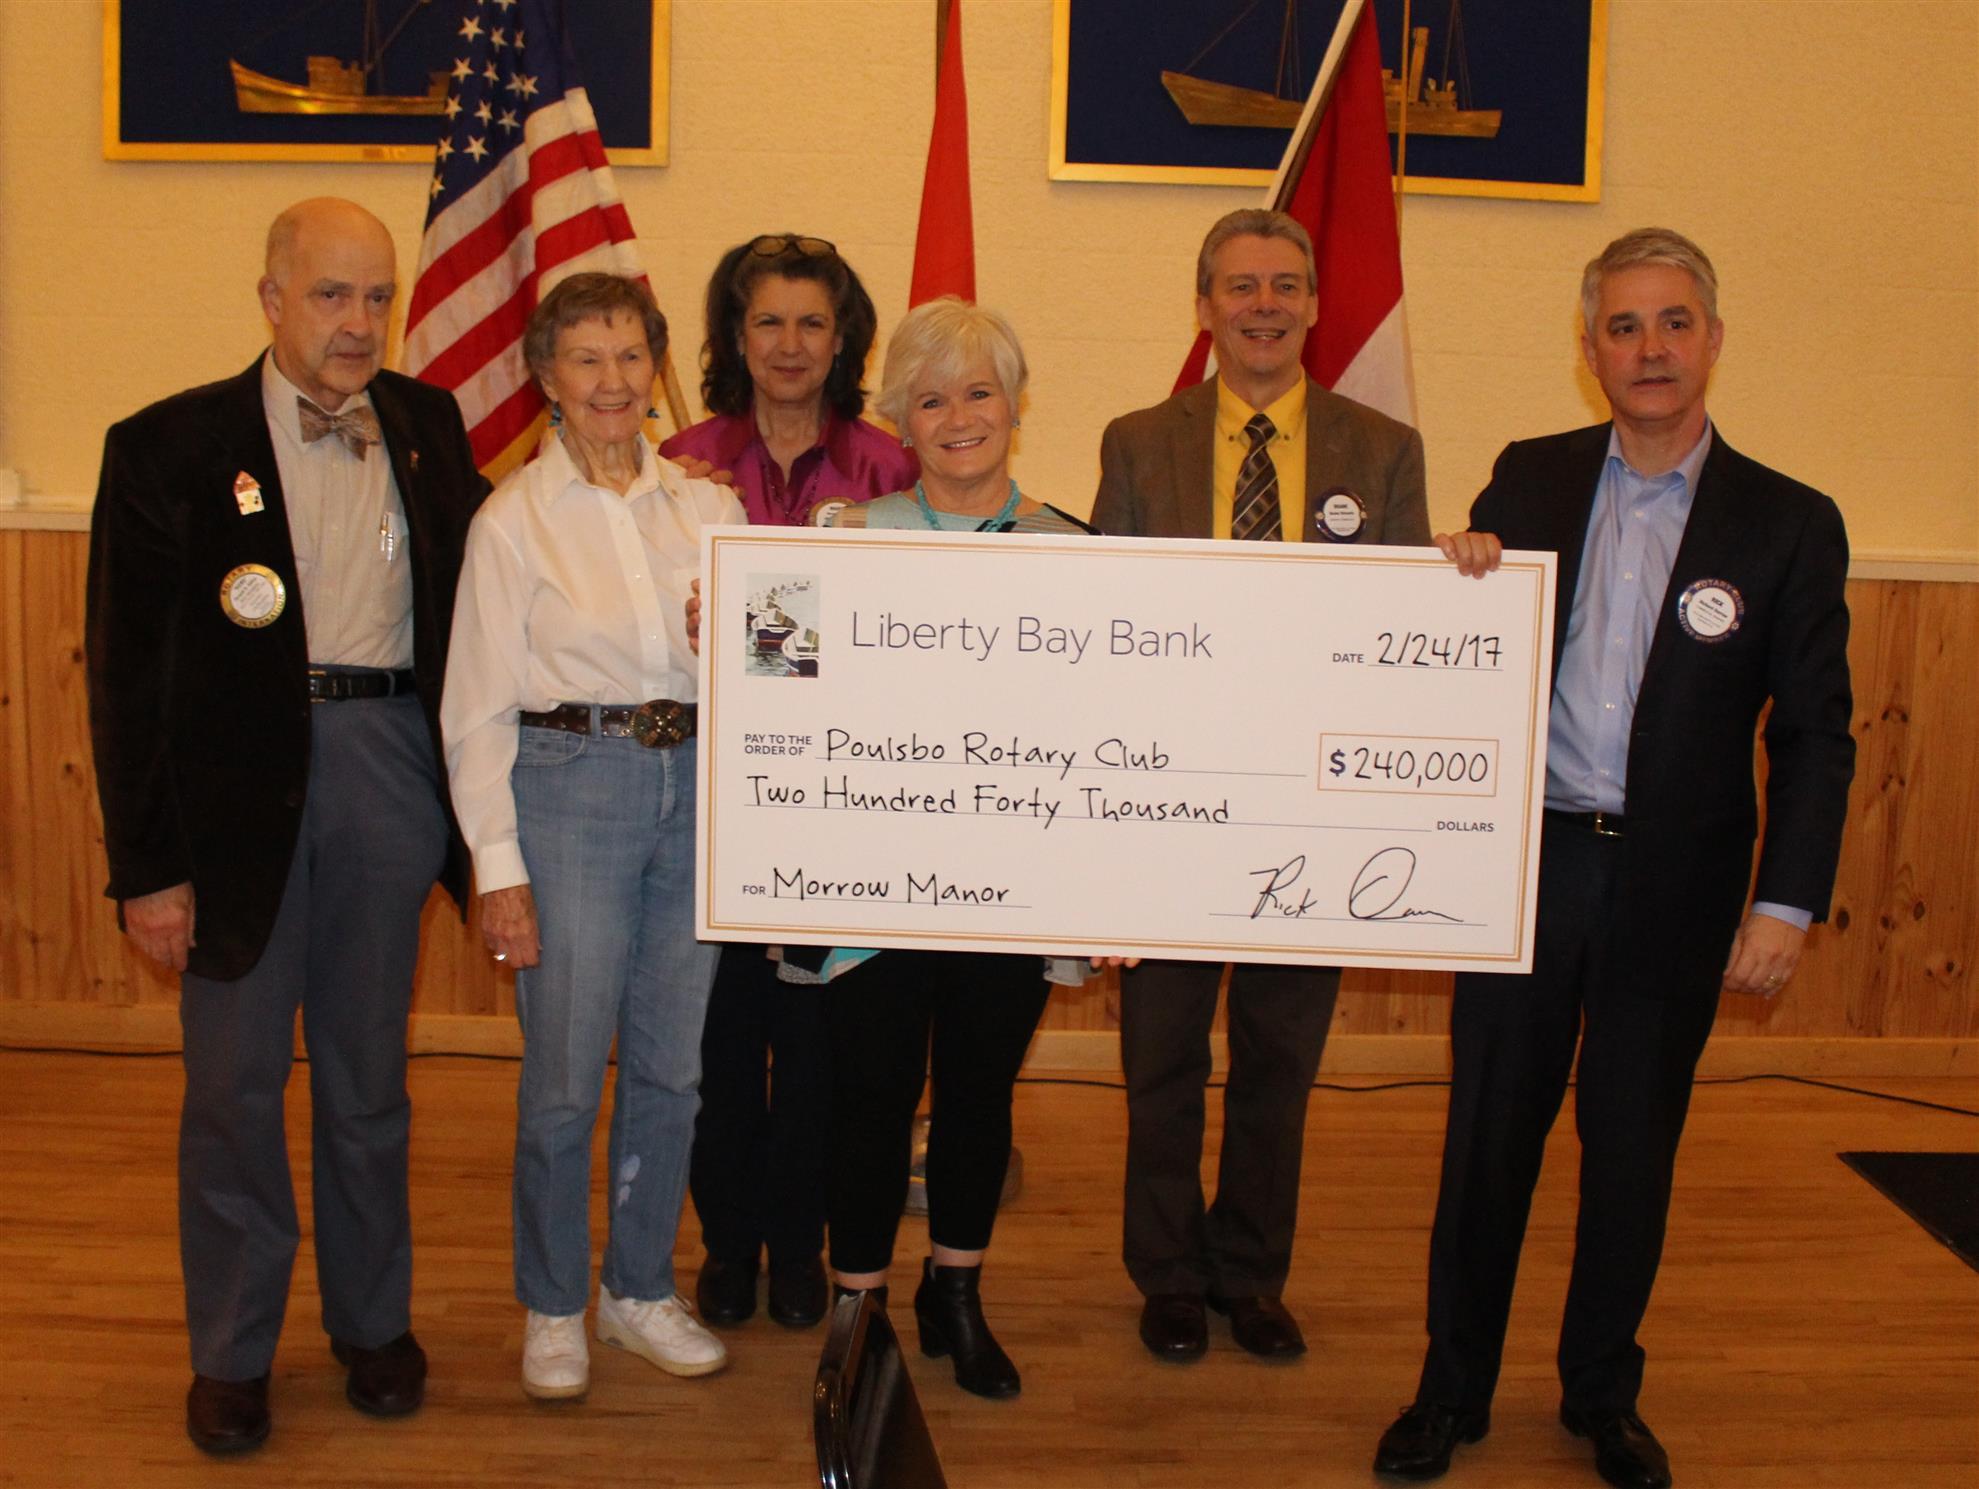 Rick Darrow presenting award to Morrow Manor